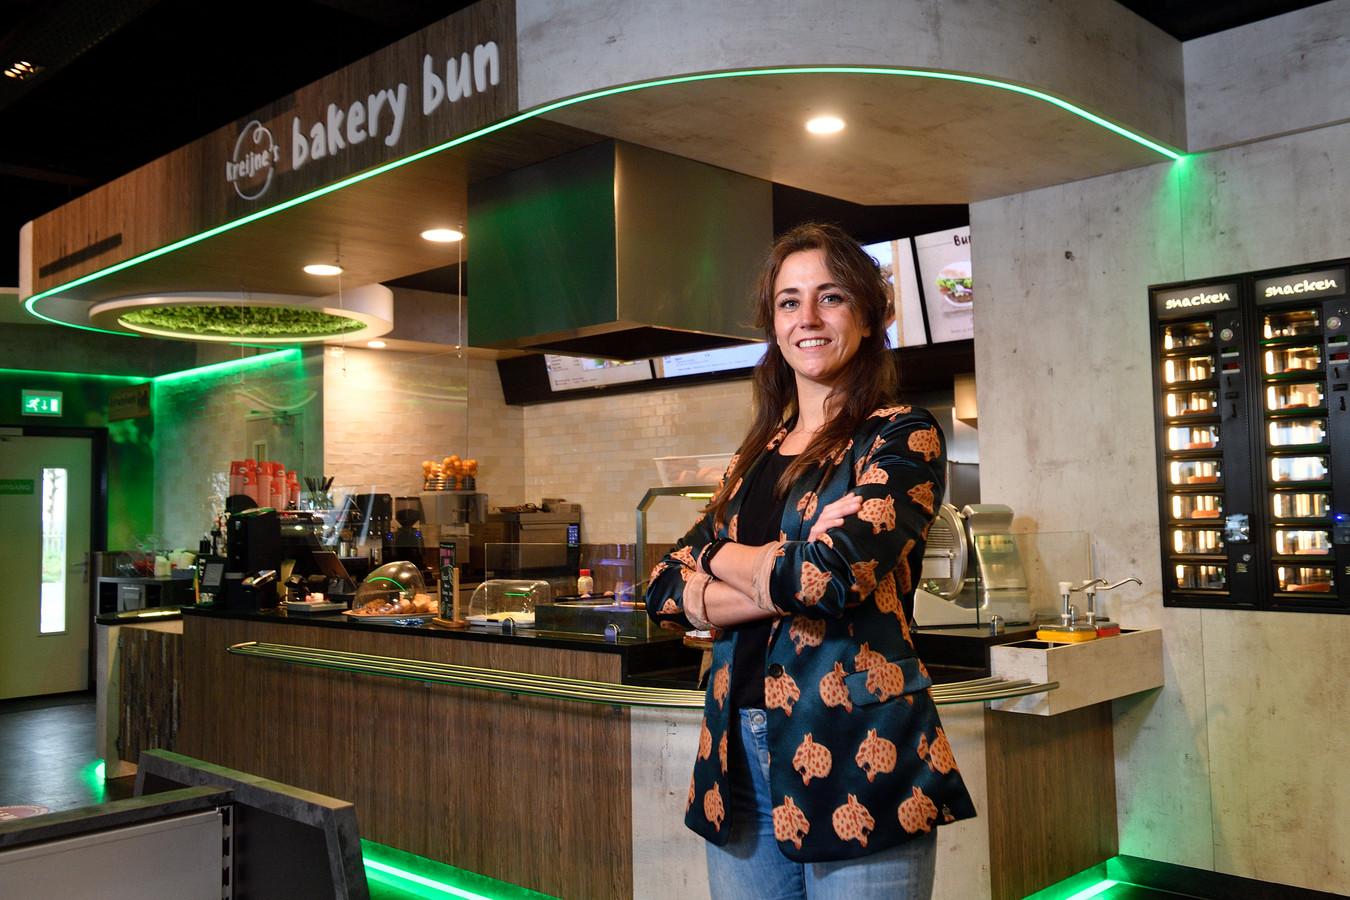 Rosan Kreijne bedacht het concept Bakery Bun.